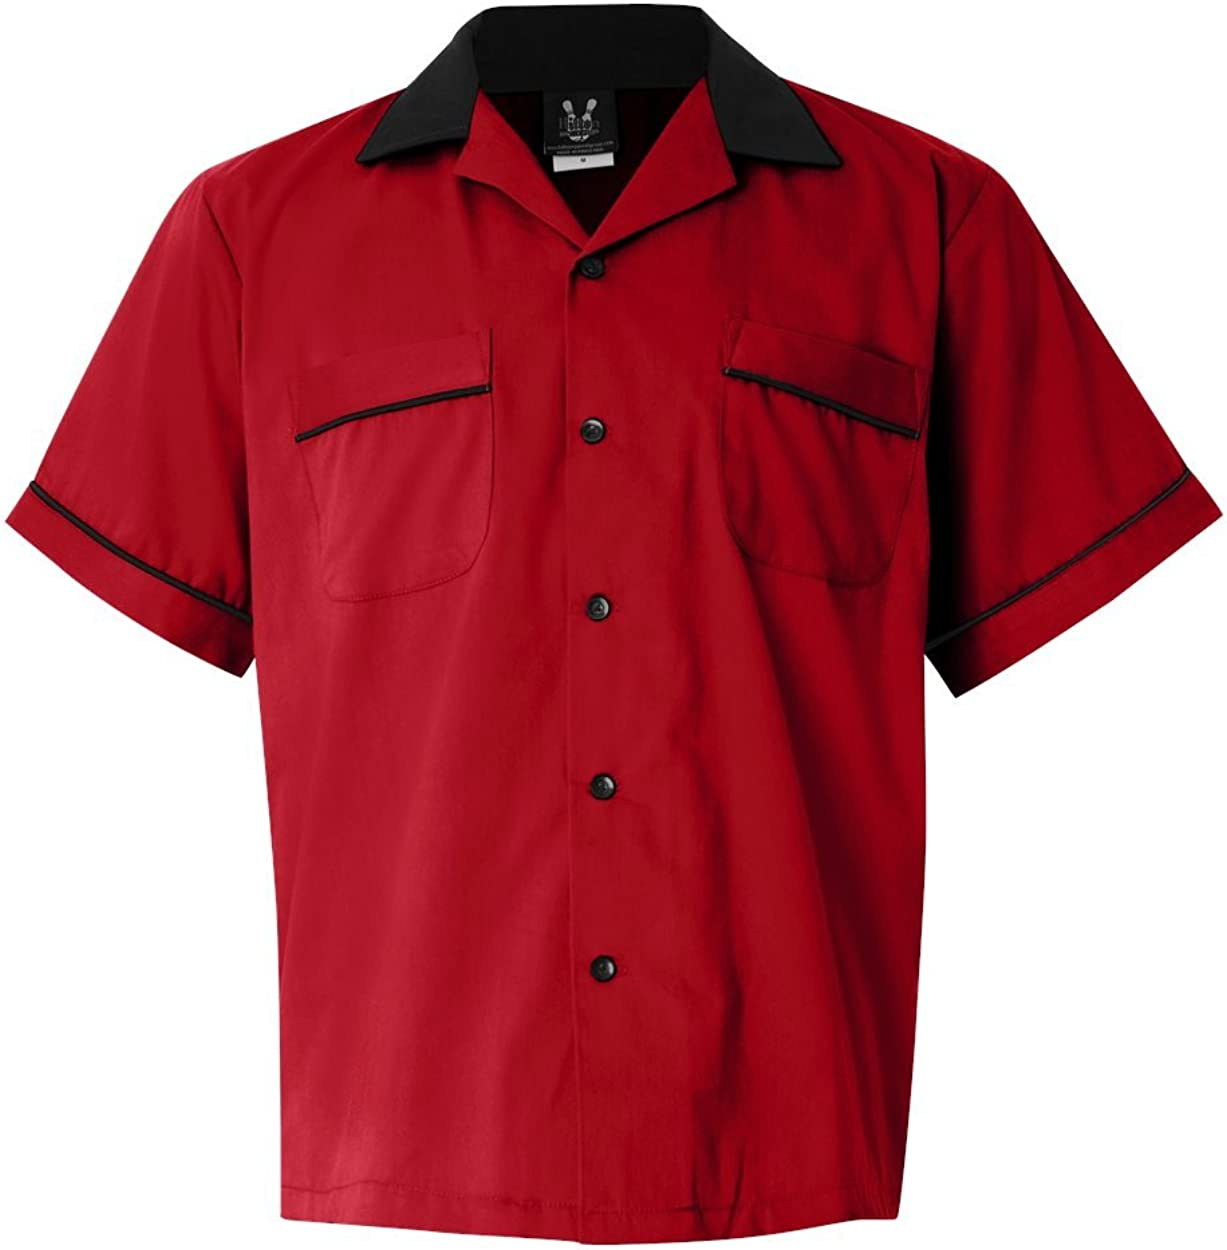 S Hilton Bowling Retro Gm Legend Red/_Black